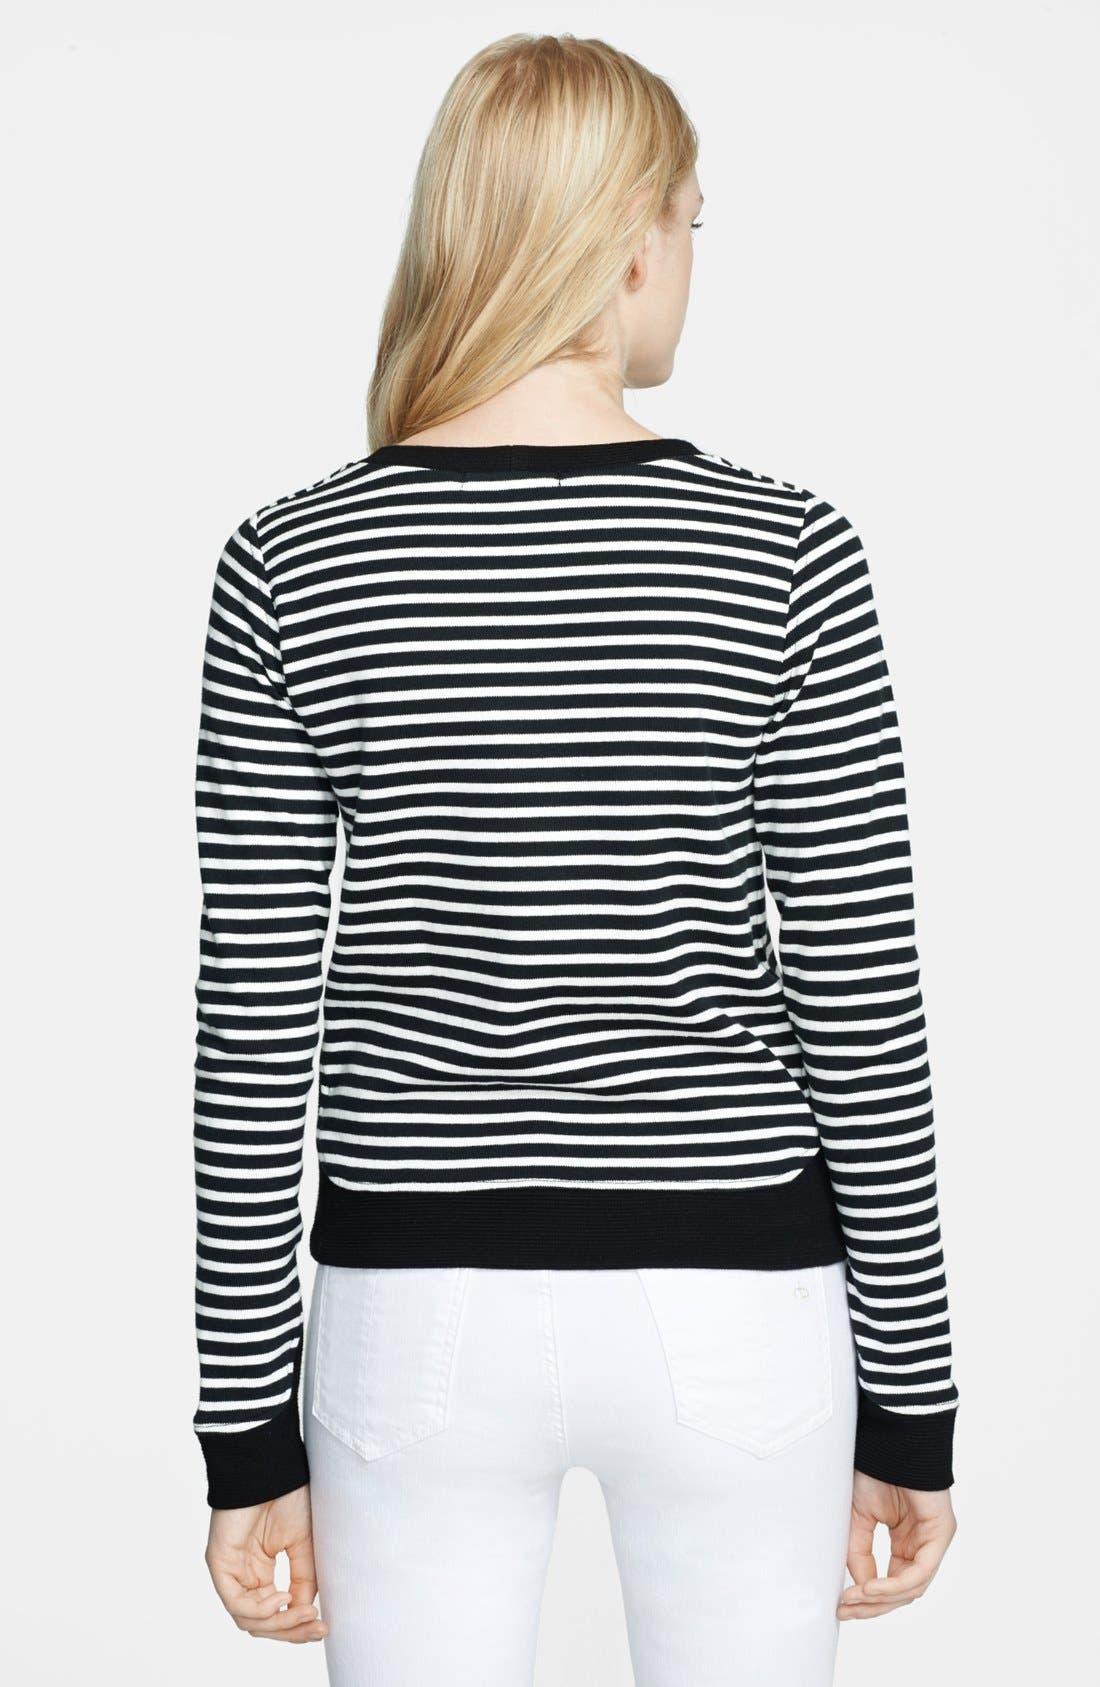 Alternate Image 2  - Whetherly 'Liam' Stripe Knit Sweater